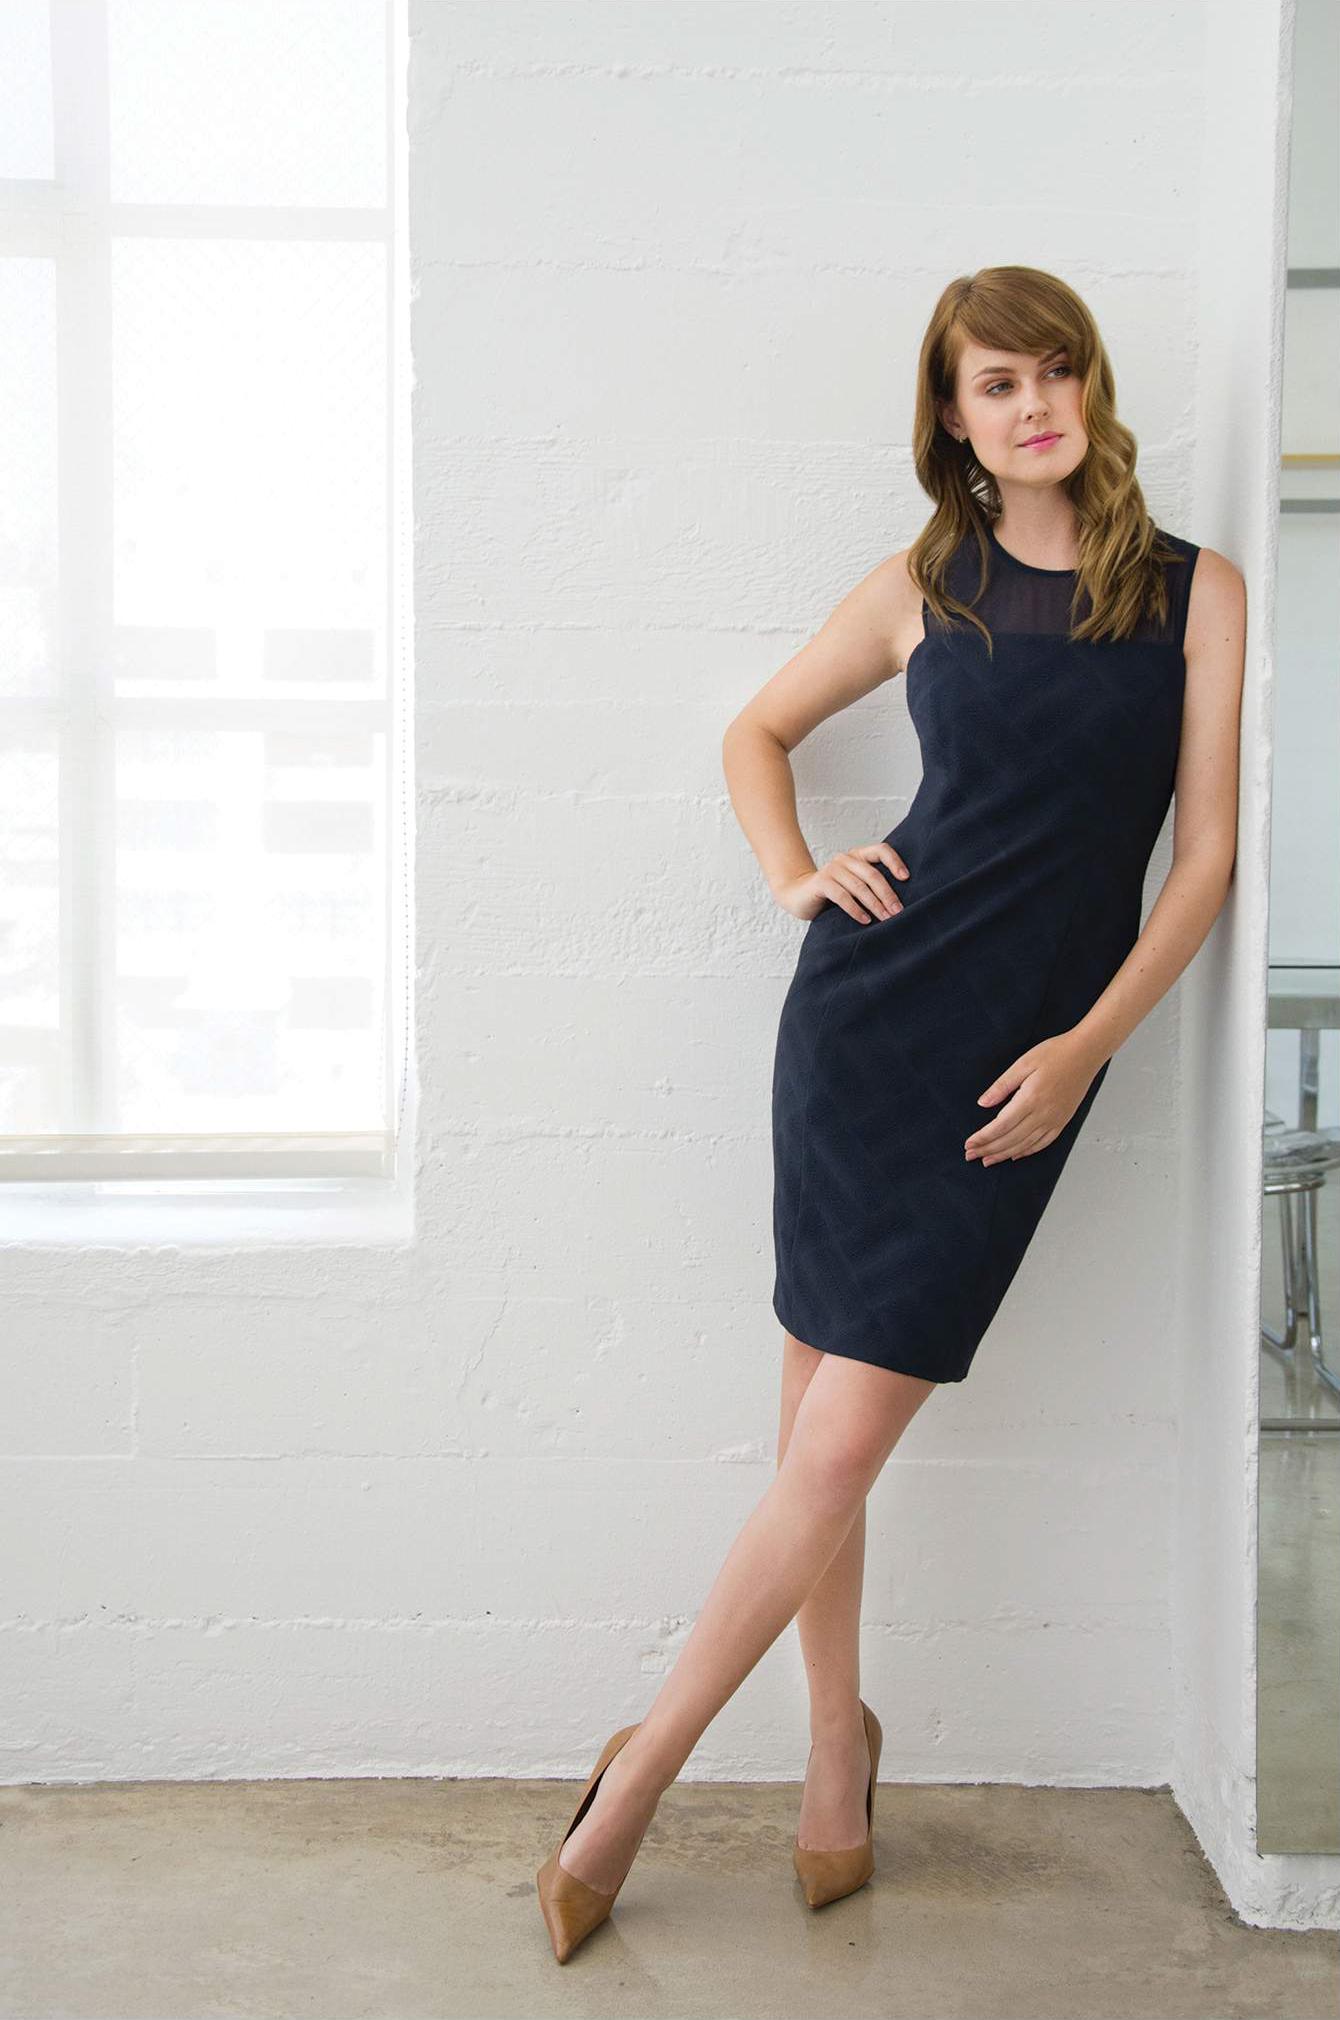 Dress: Rica - SANTORELLI